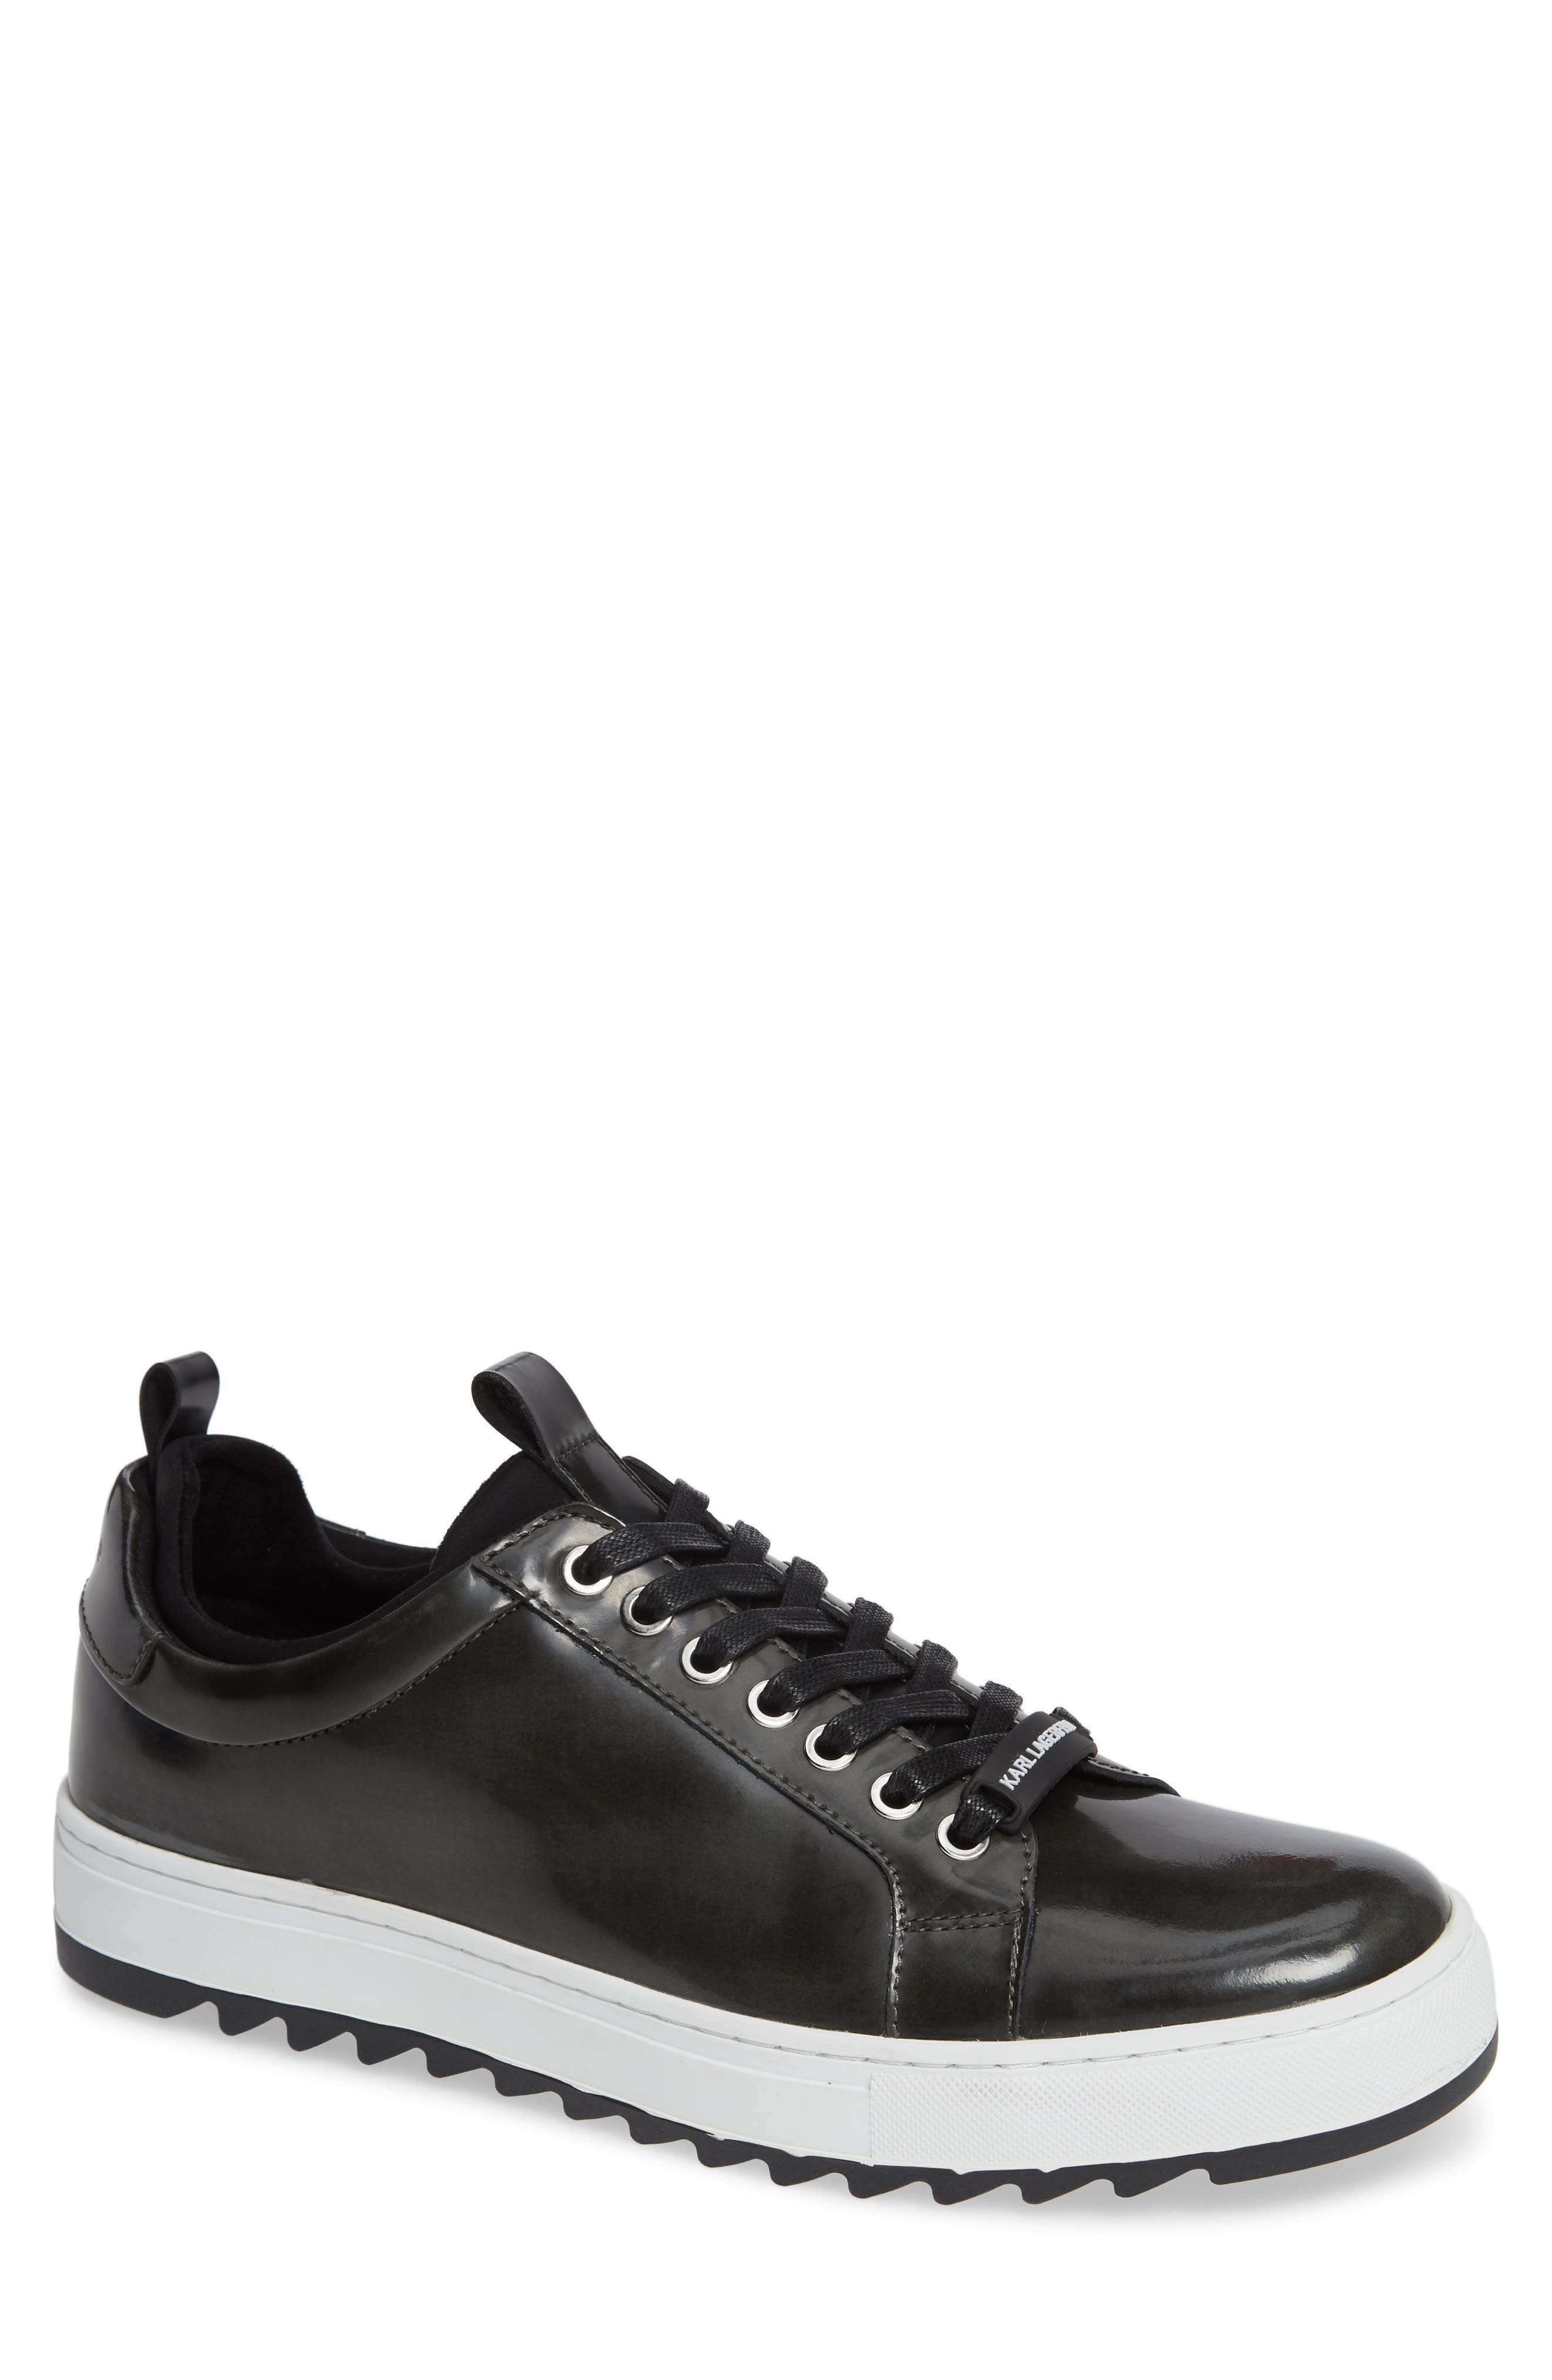 Box Inner Sock Sneaker,                         Main,                         color, 055